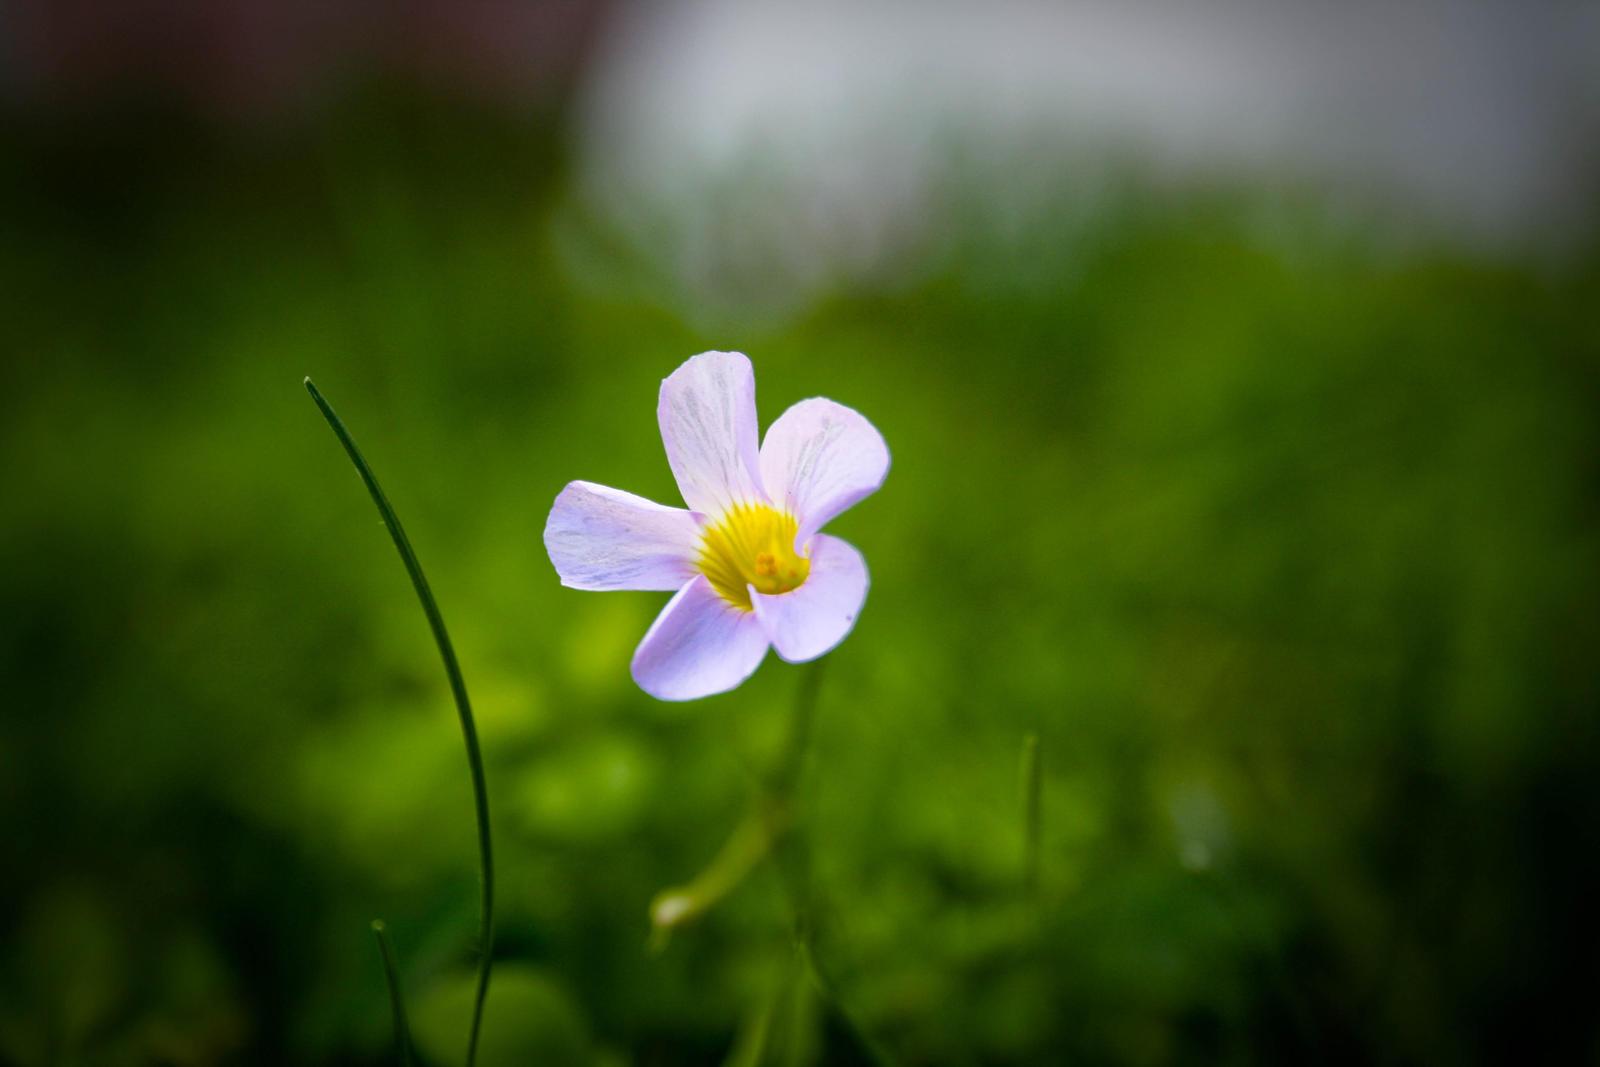 Little Flower by ystermyt on deviantART